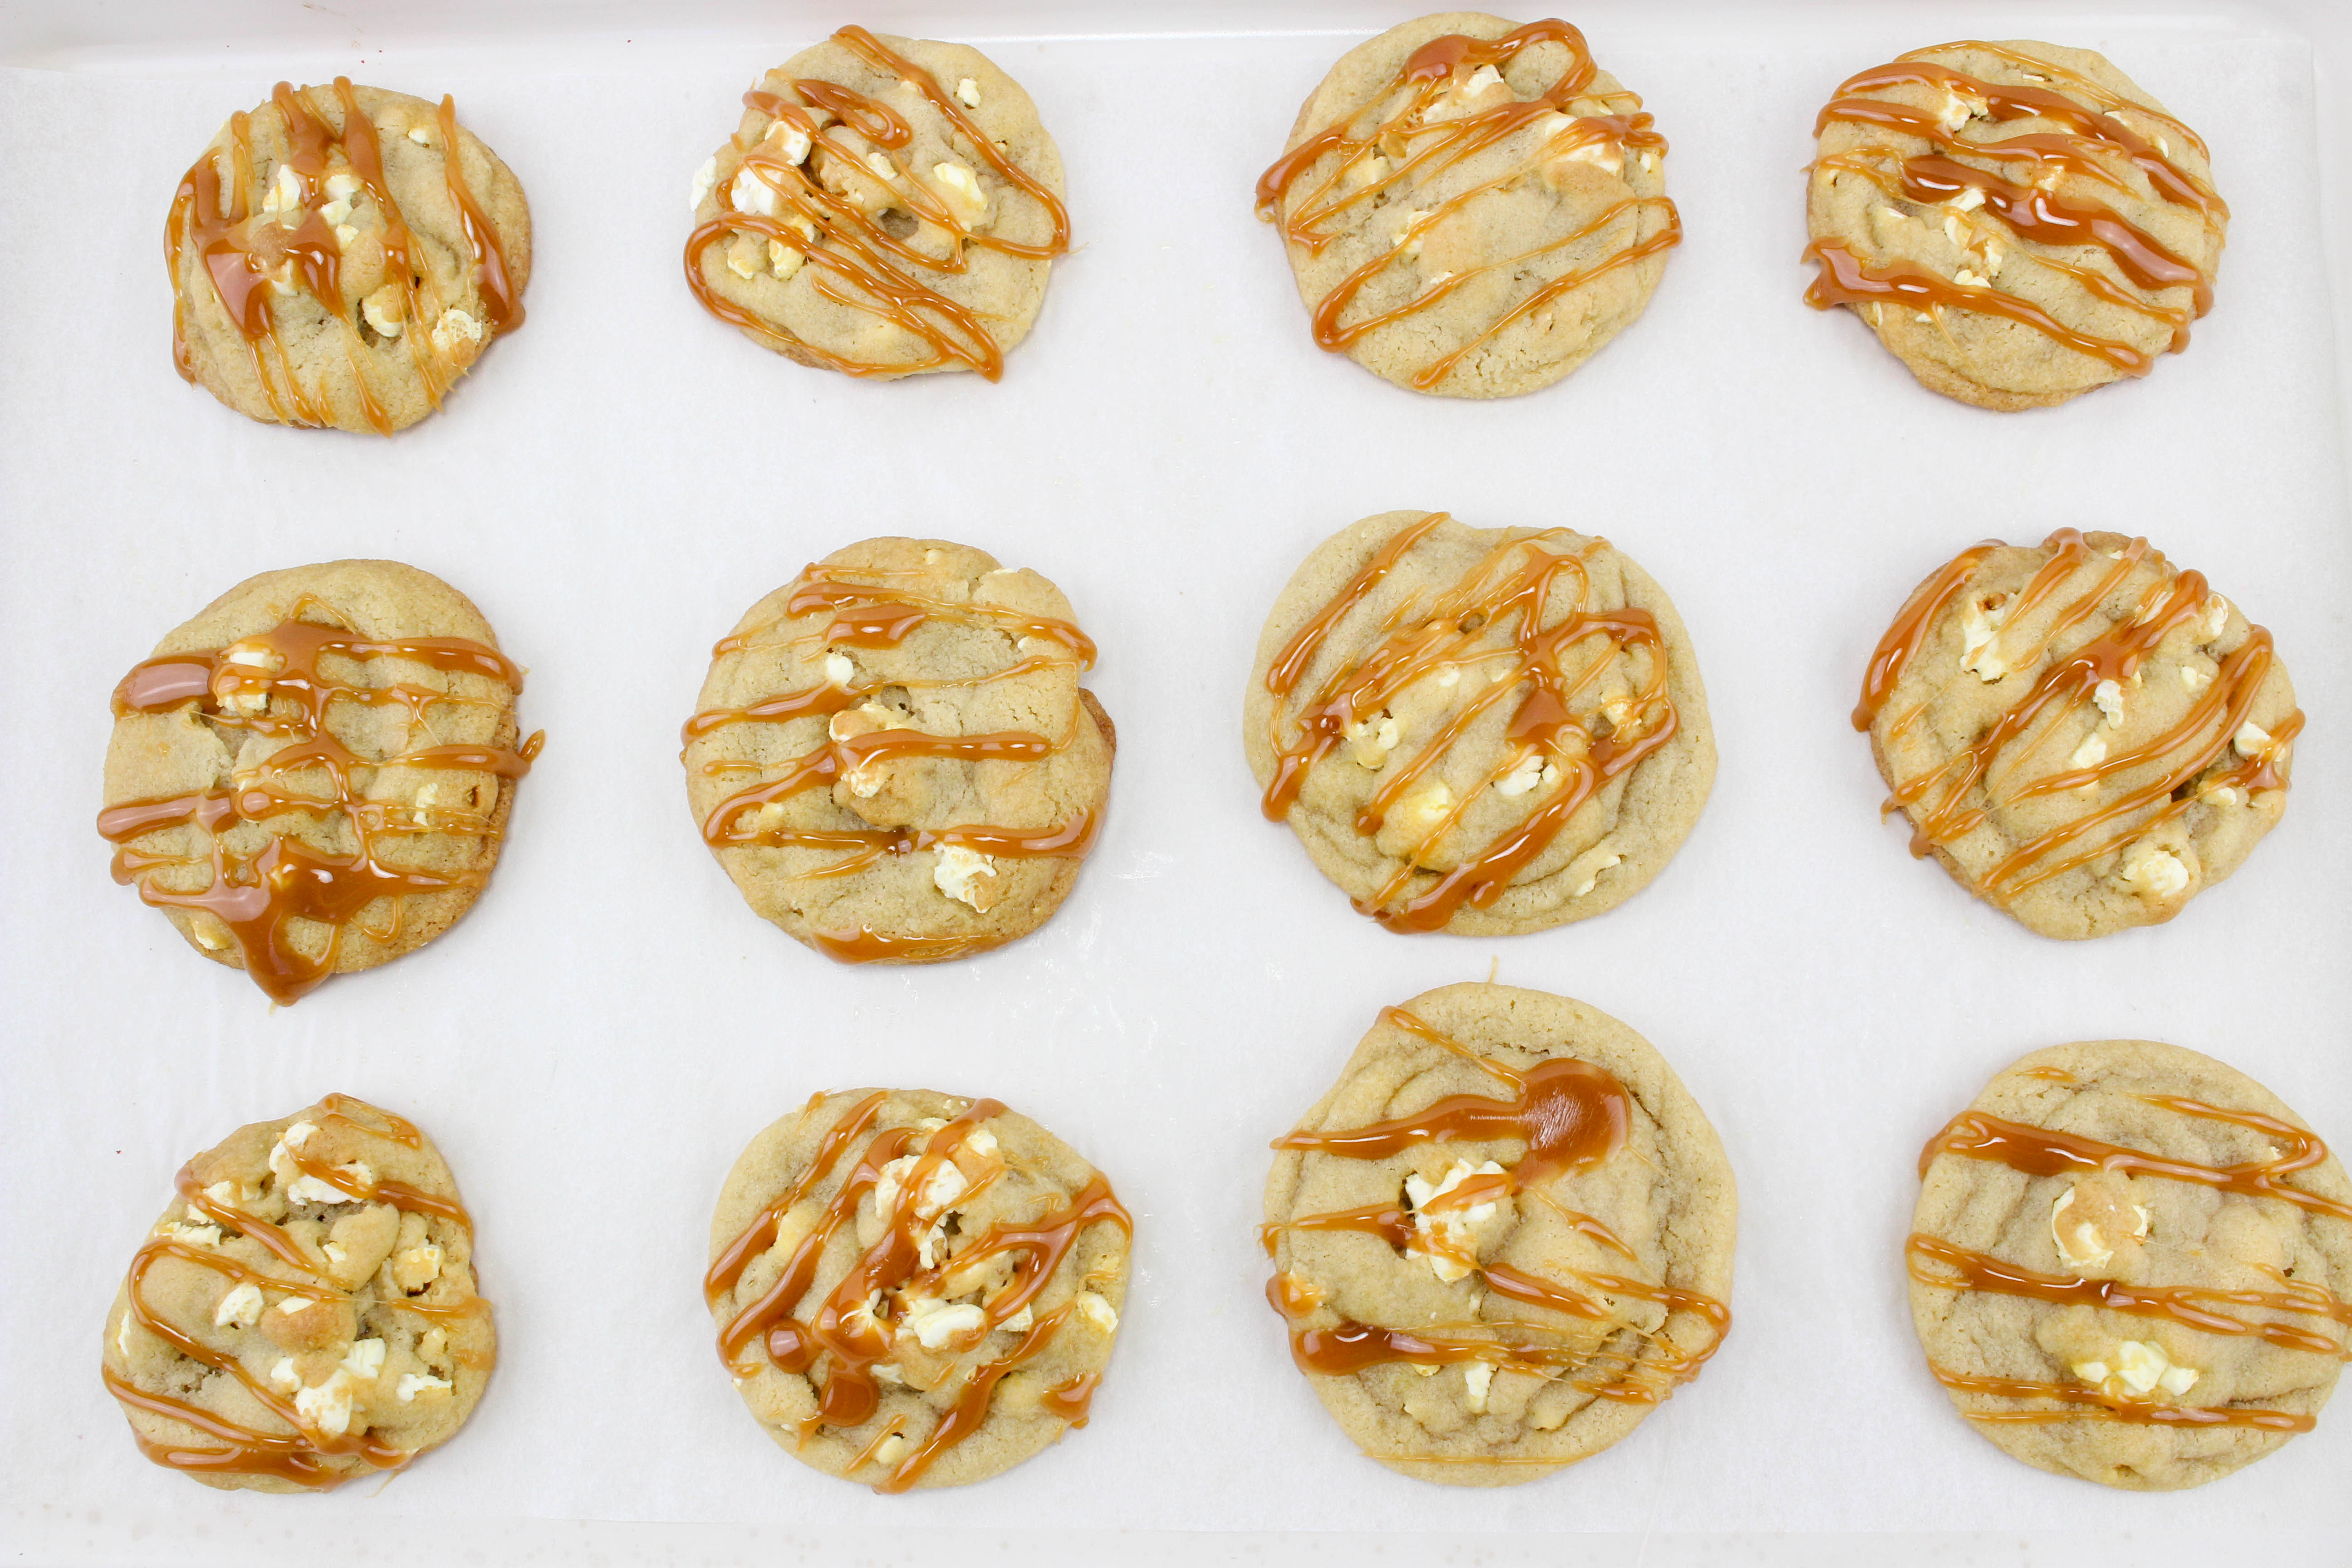 Caramel Buttered Popcorn Cookies